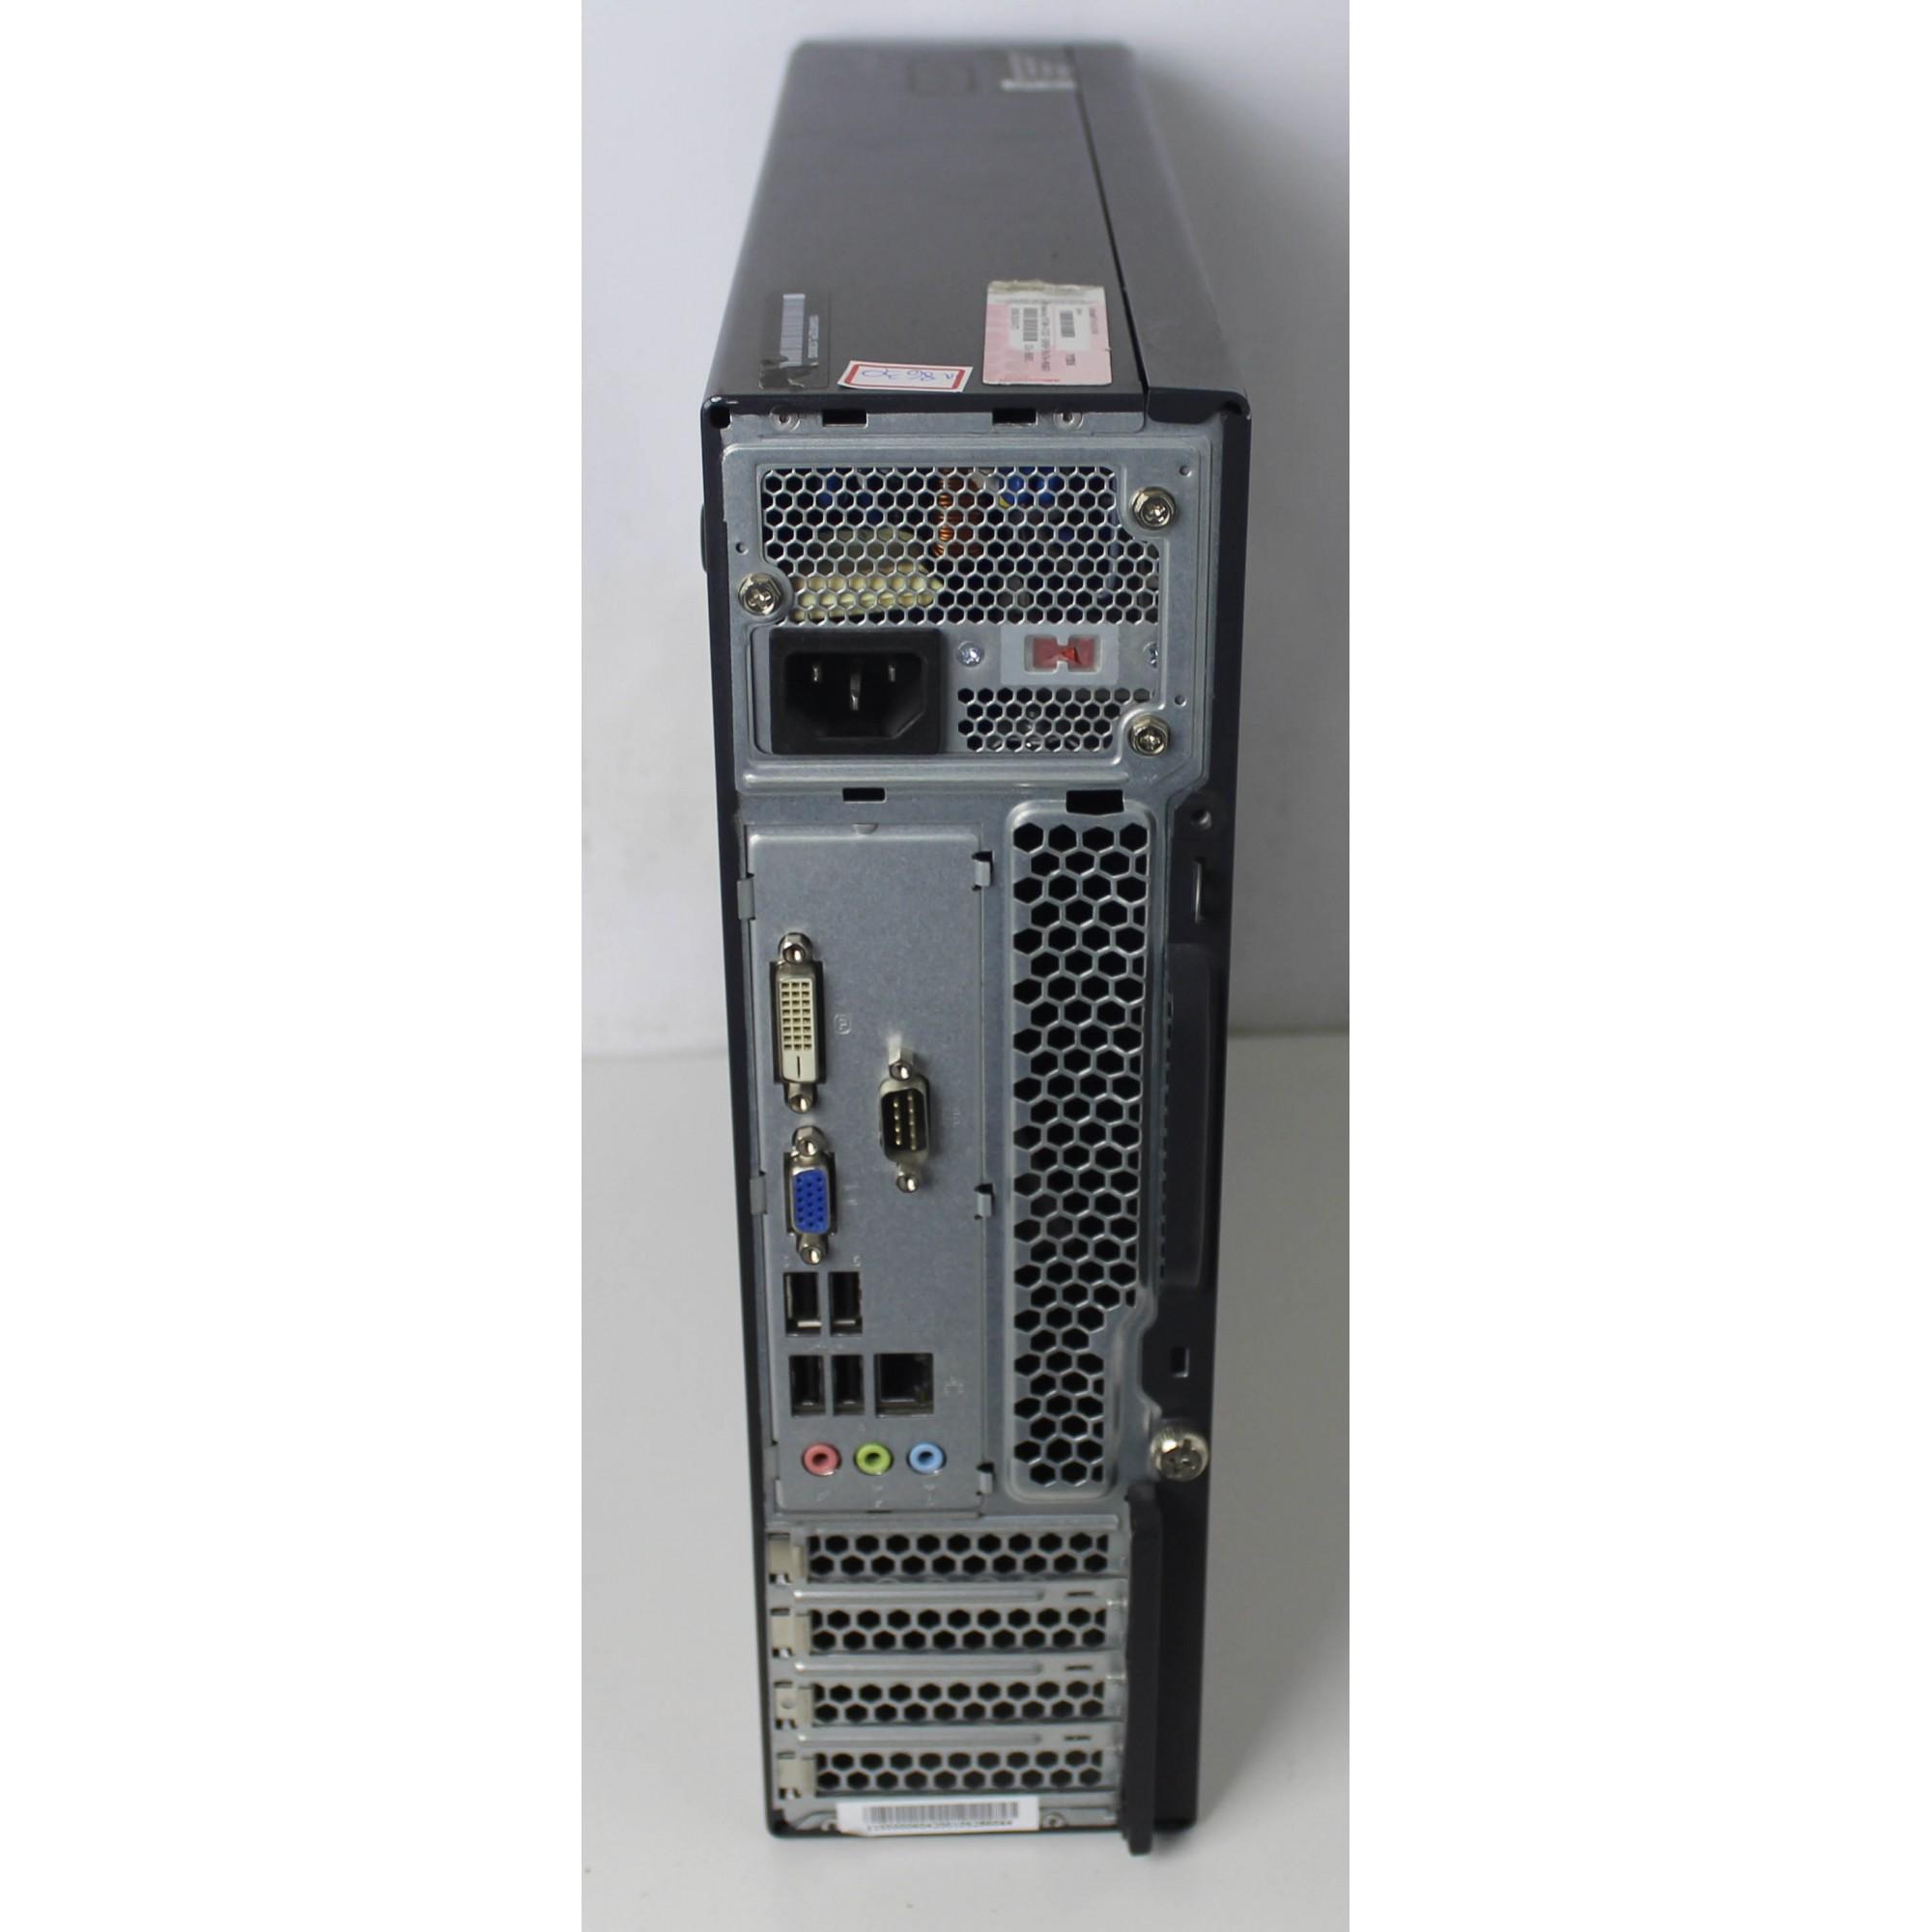 CPU Empresarial Lenovo Thinkcentre Edge72 Intel Core i5 2.9Ghz 8GB HD-500GB